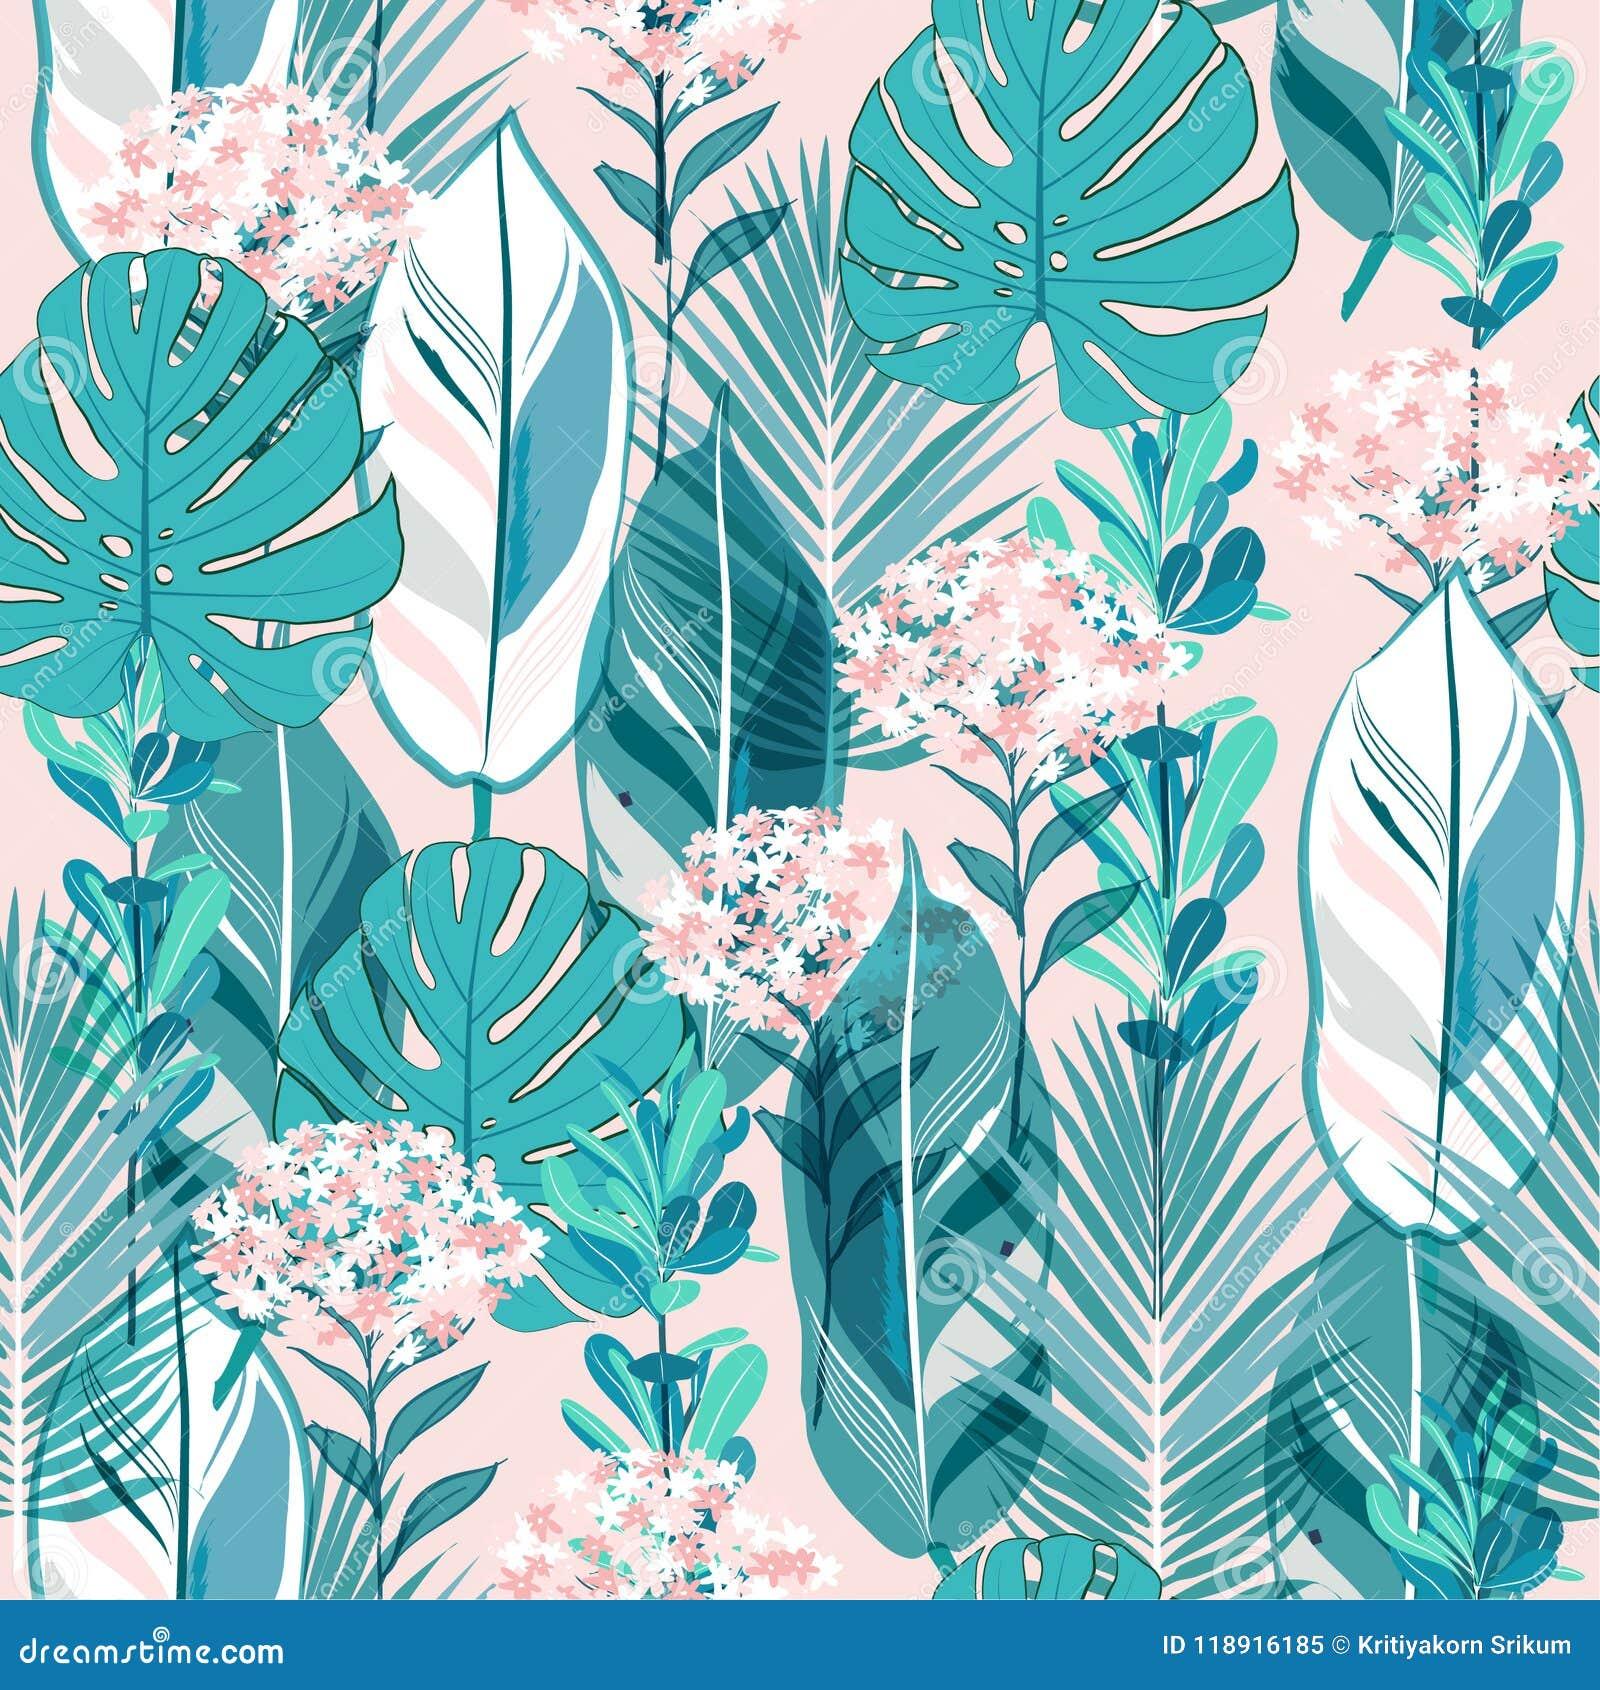 Soft pastel botanical jungle leaves pattern, tropical seamless,